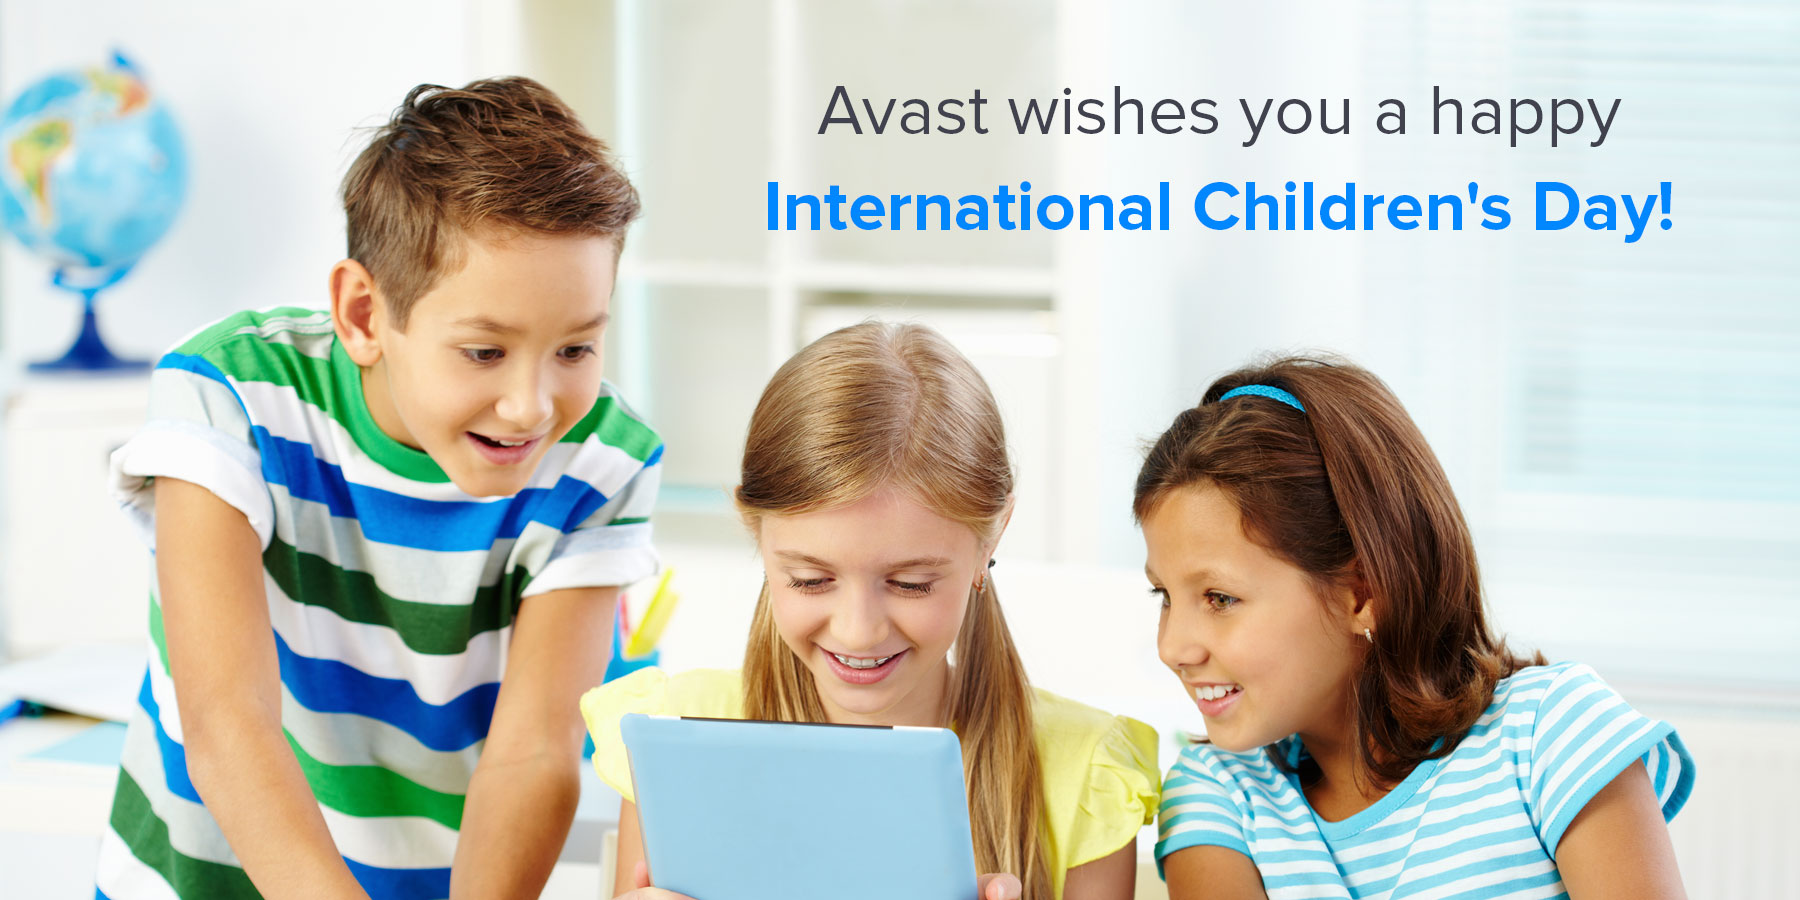 Happy International Children's Day from Avast!